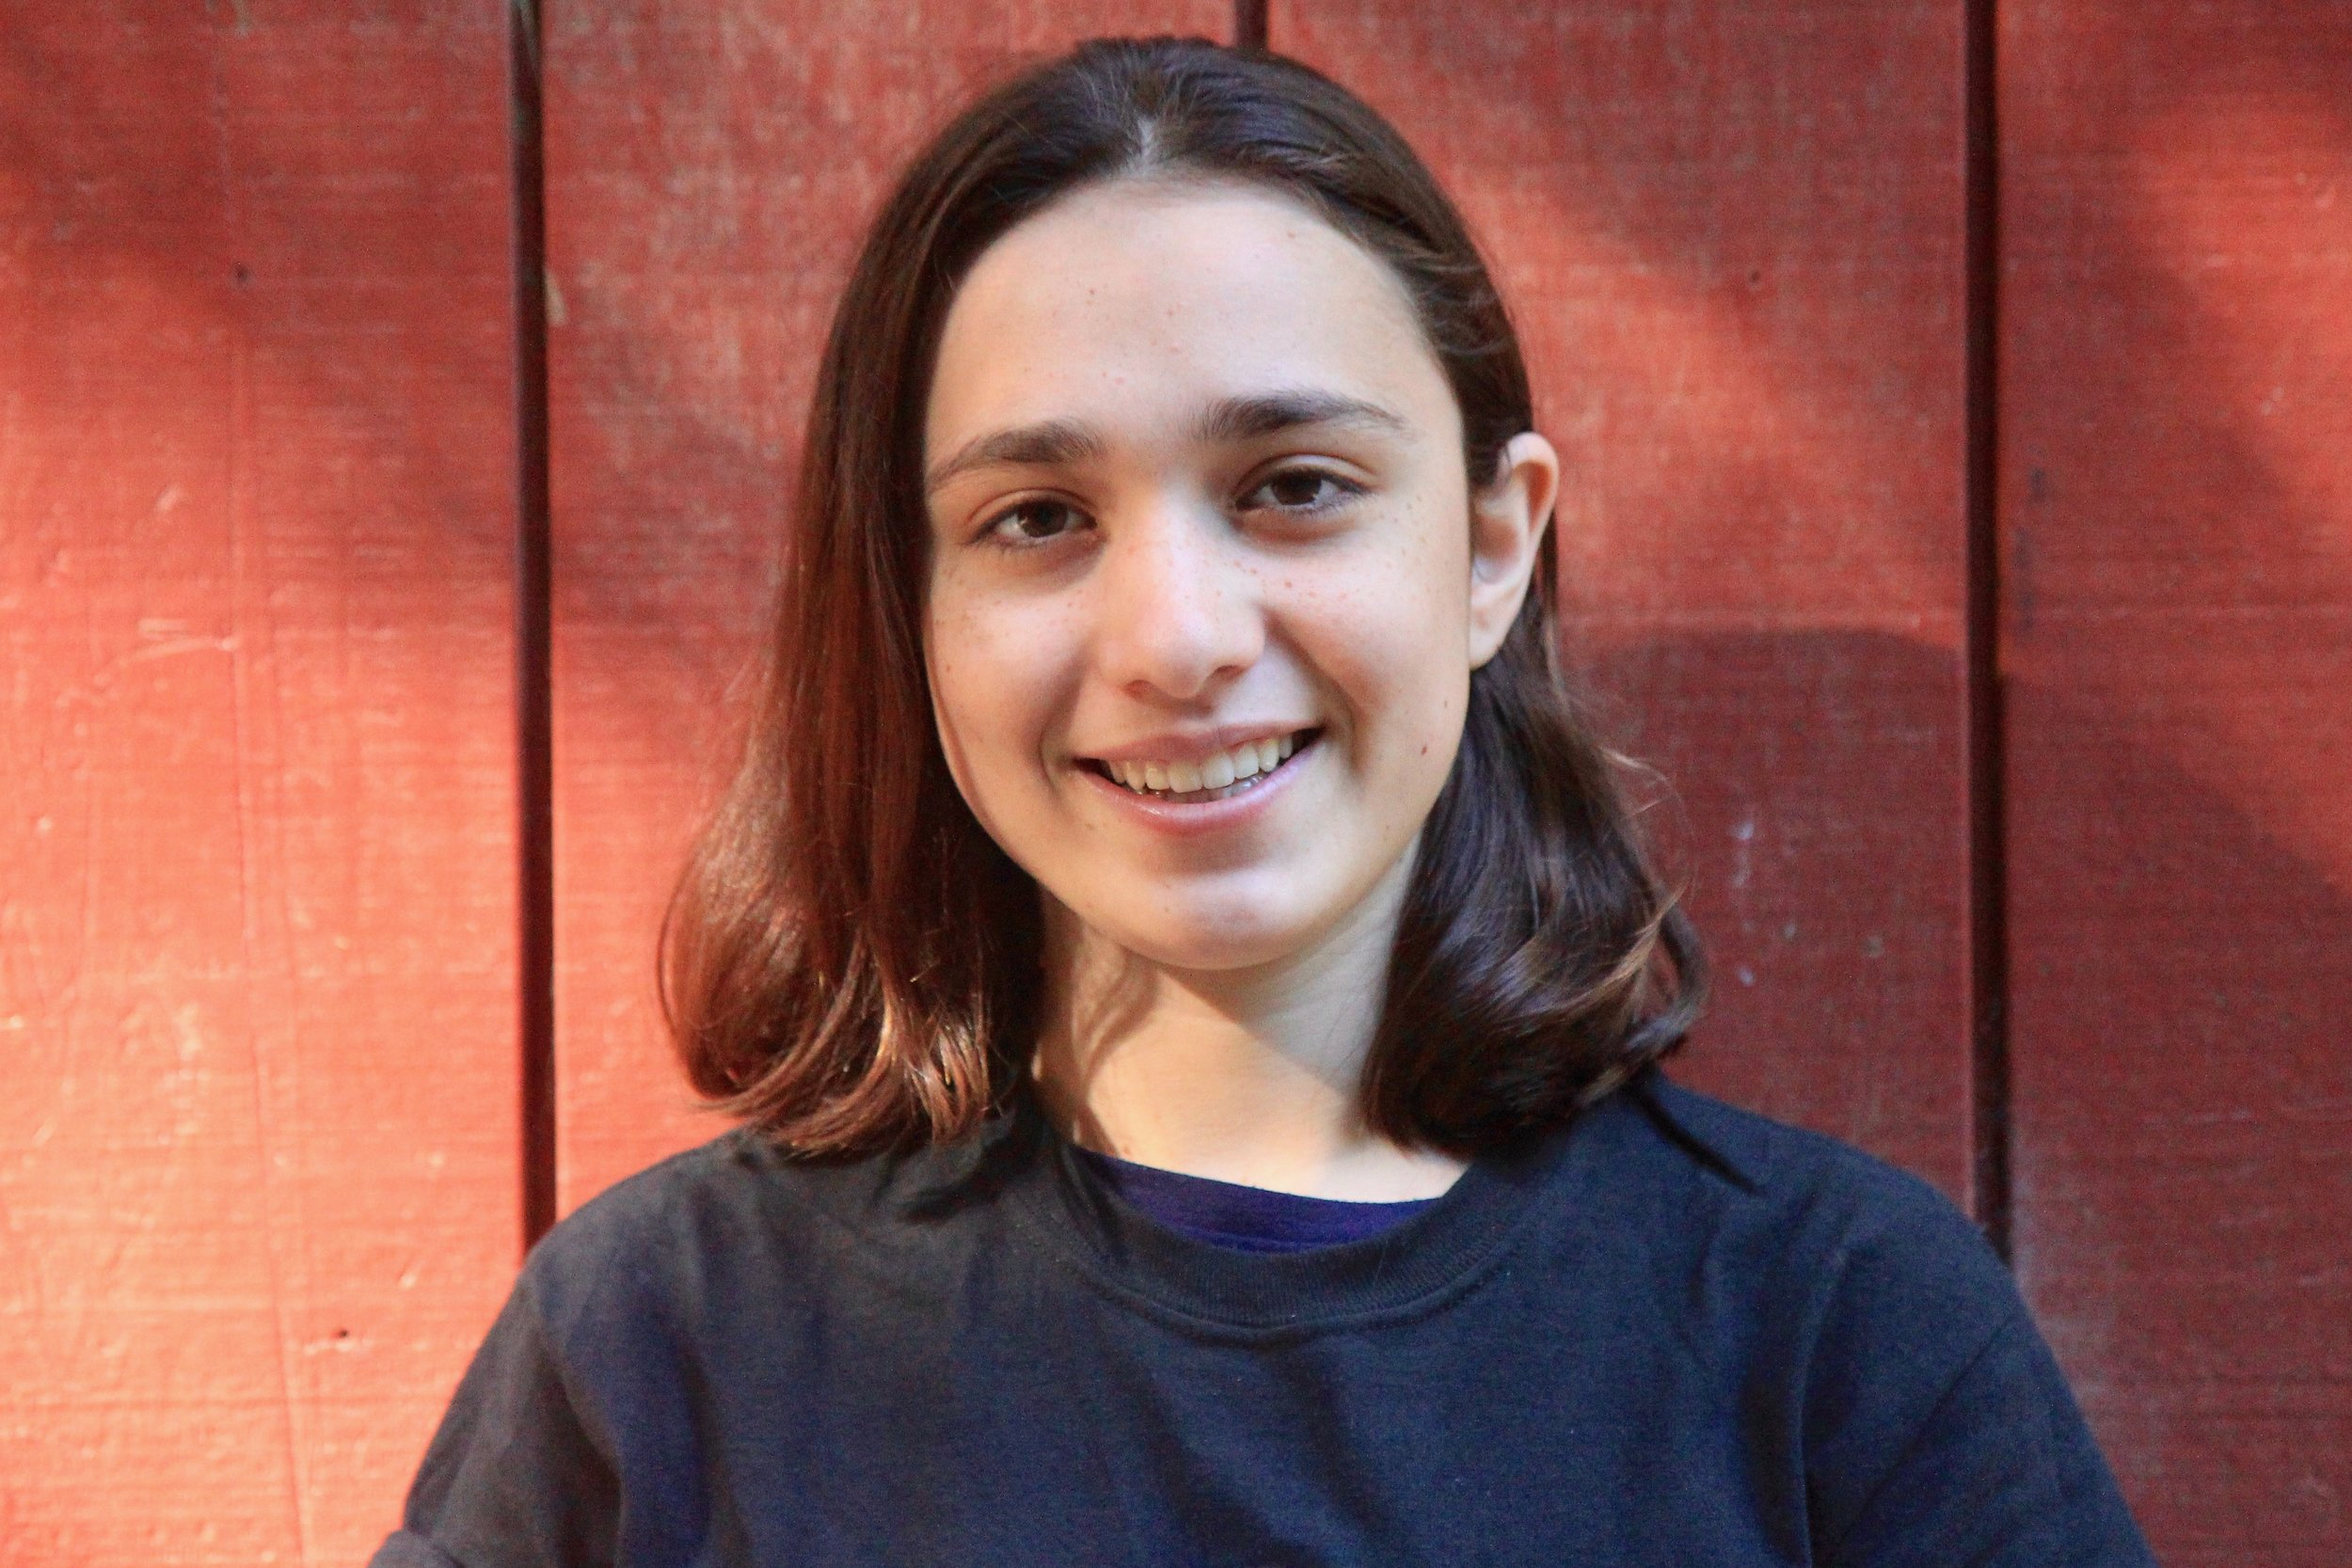 Eliana Goldstein, Contra Costa Jewish Day School, Concord